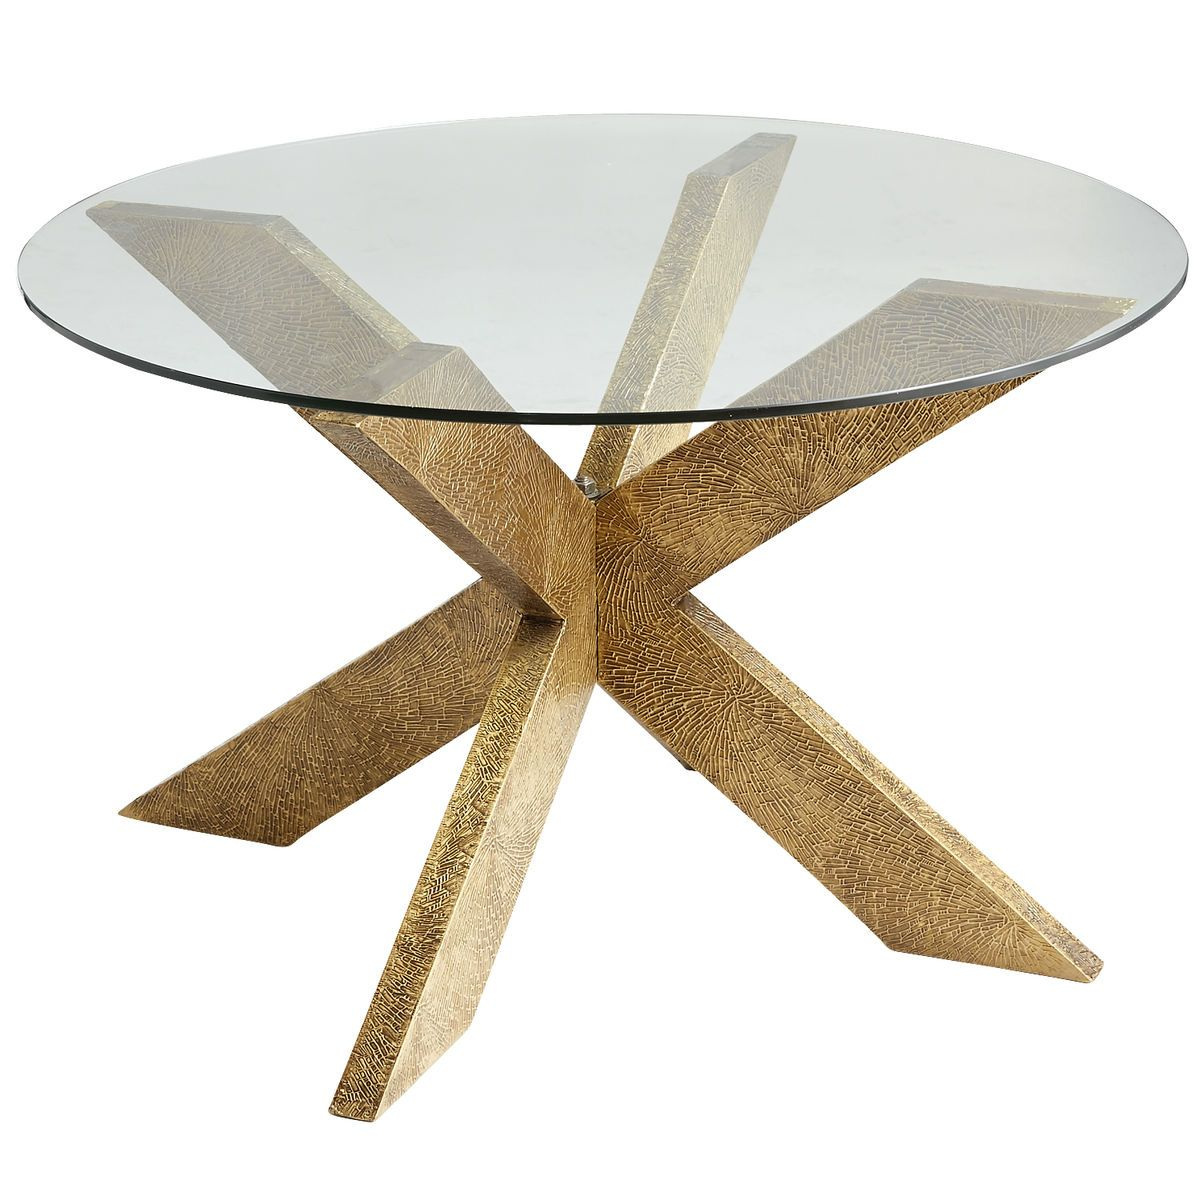 Simon X Brass Coffee Table Base Pier 1 Imports Coffee Table X Coffee Table Bronze Coffee Table